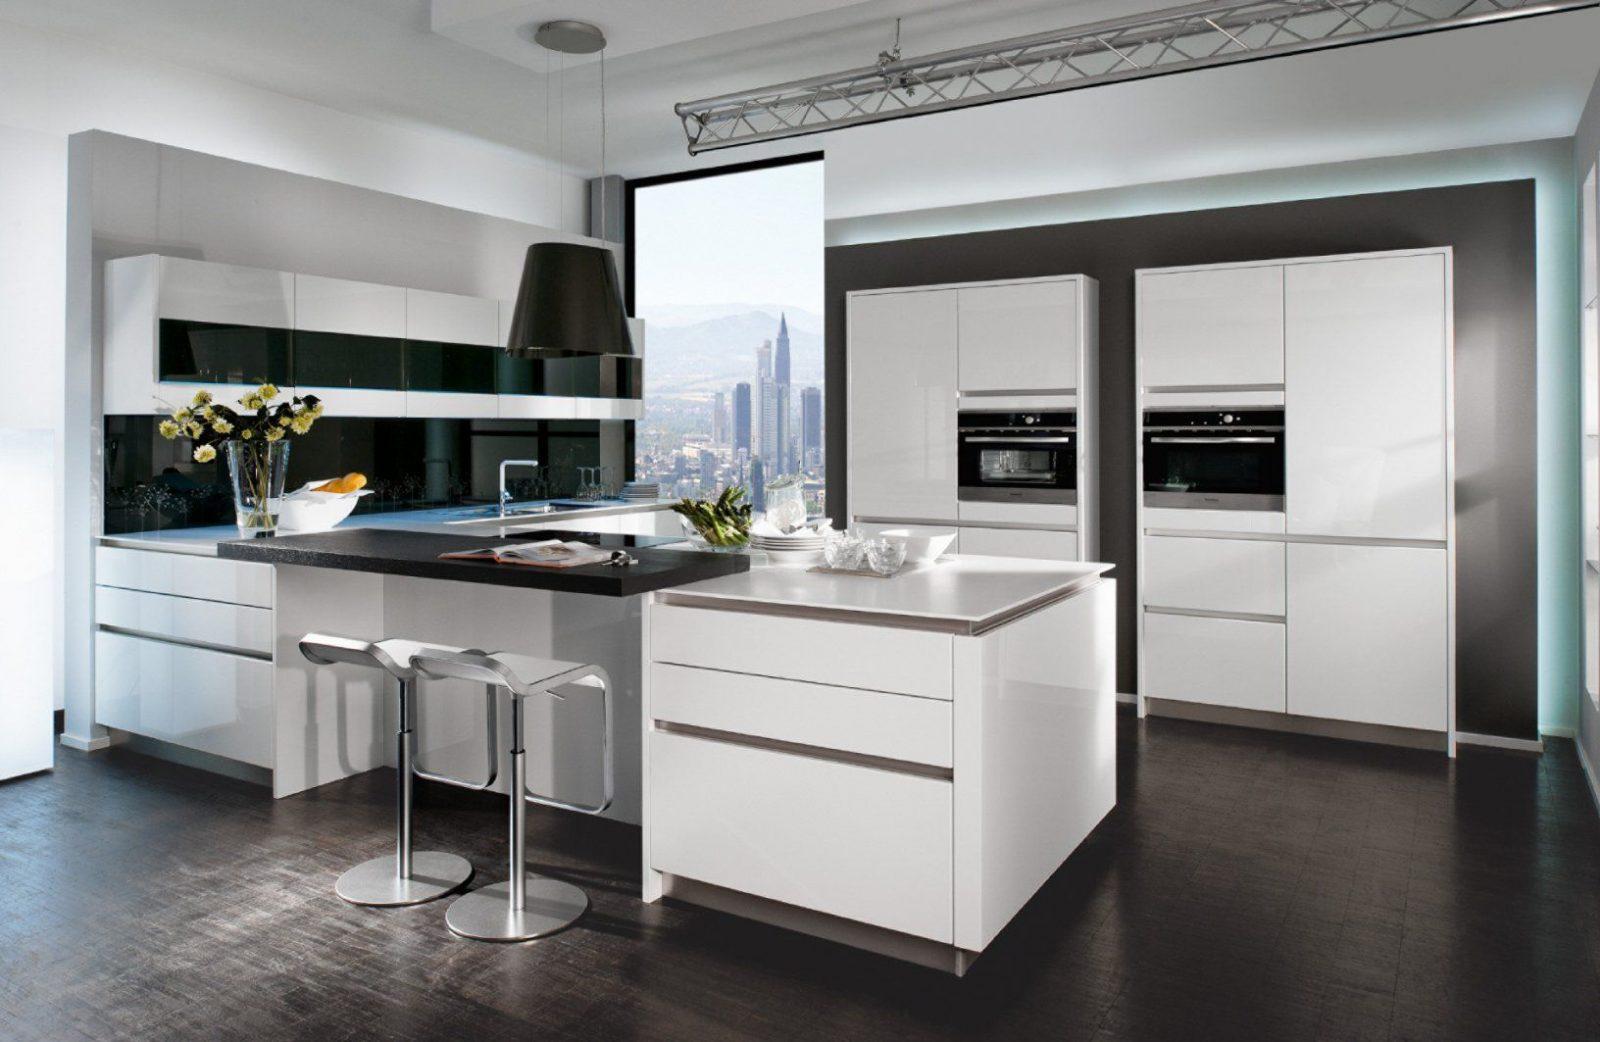 Ikea Küche Mit Kochinsel